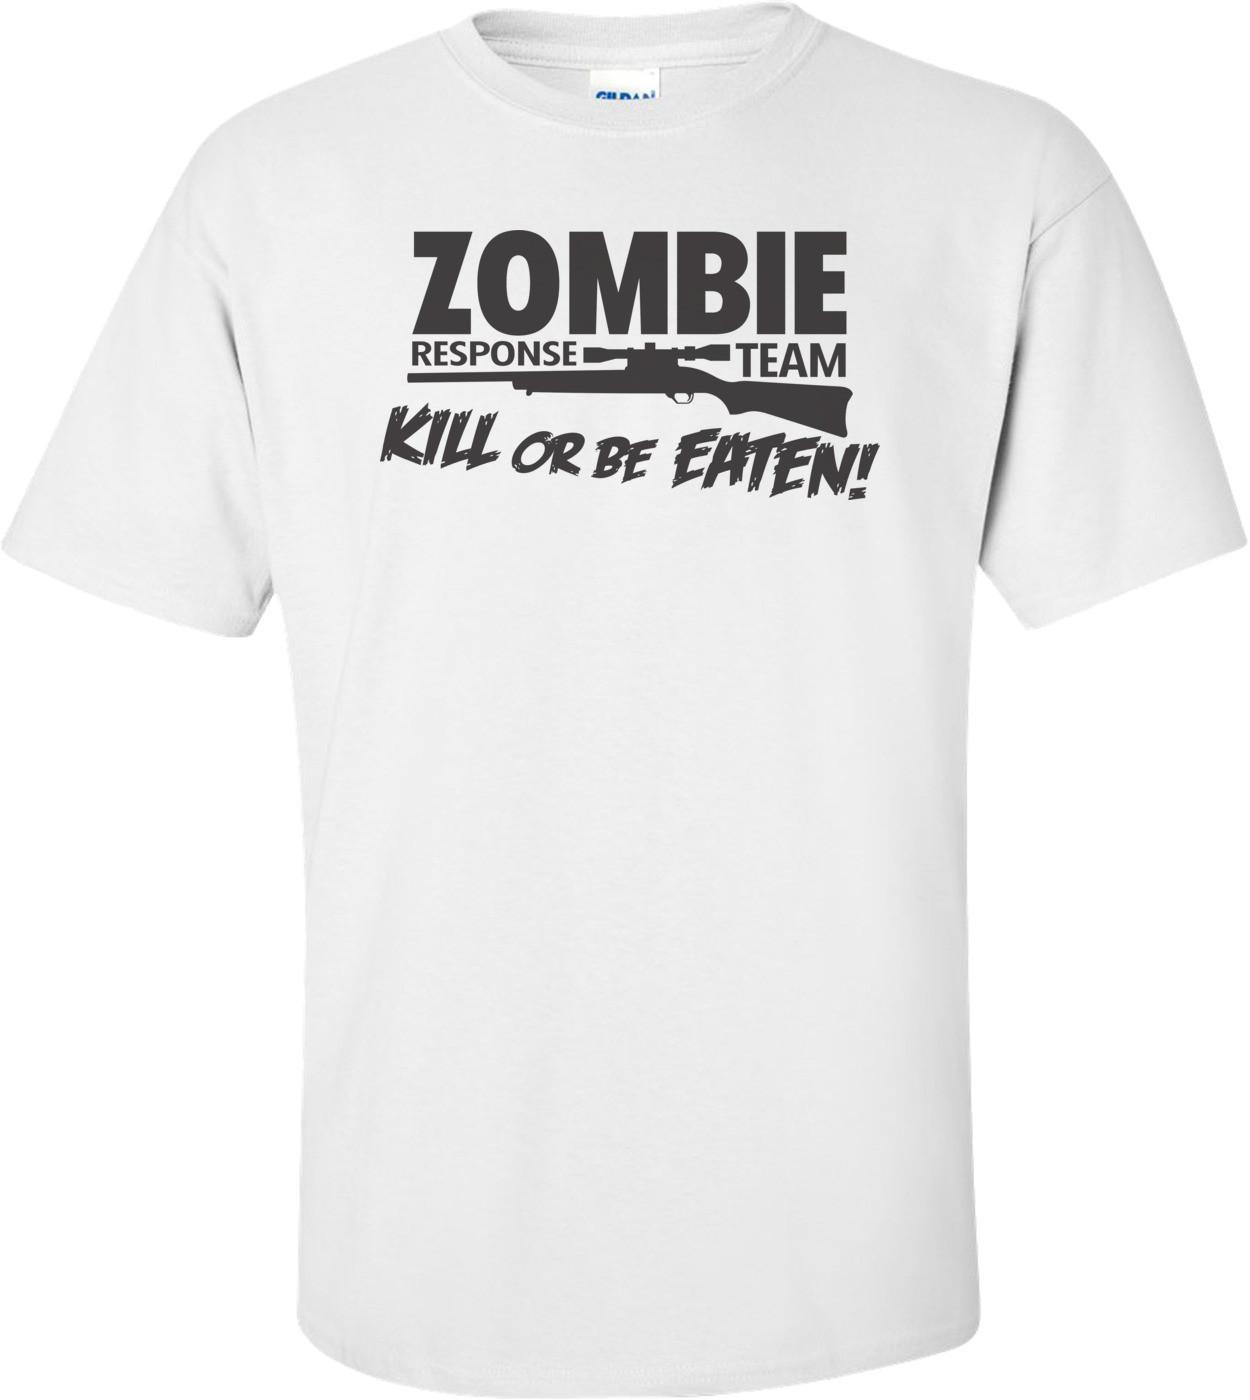 Zombie Response Team Kill Or Be Eaten T-shirt